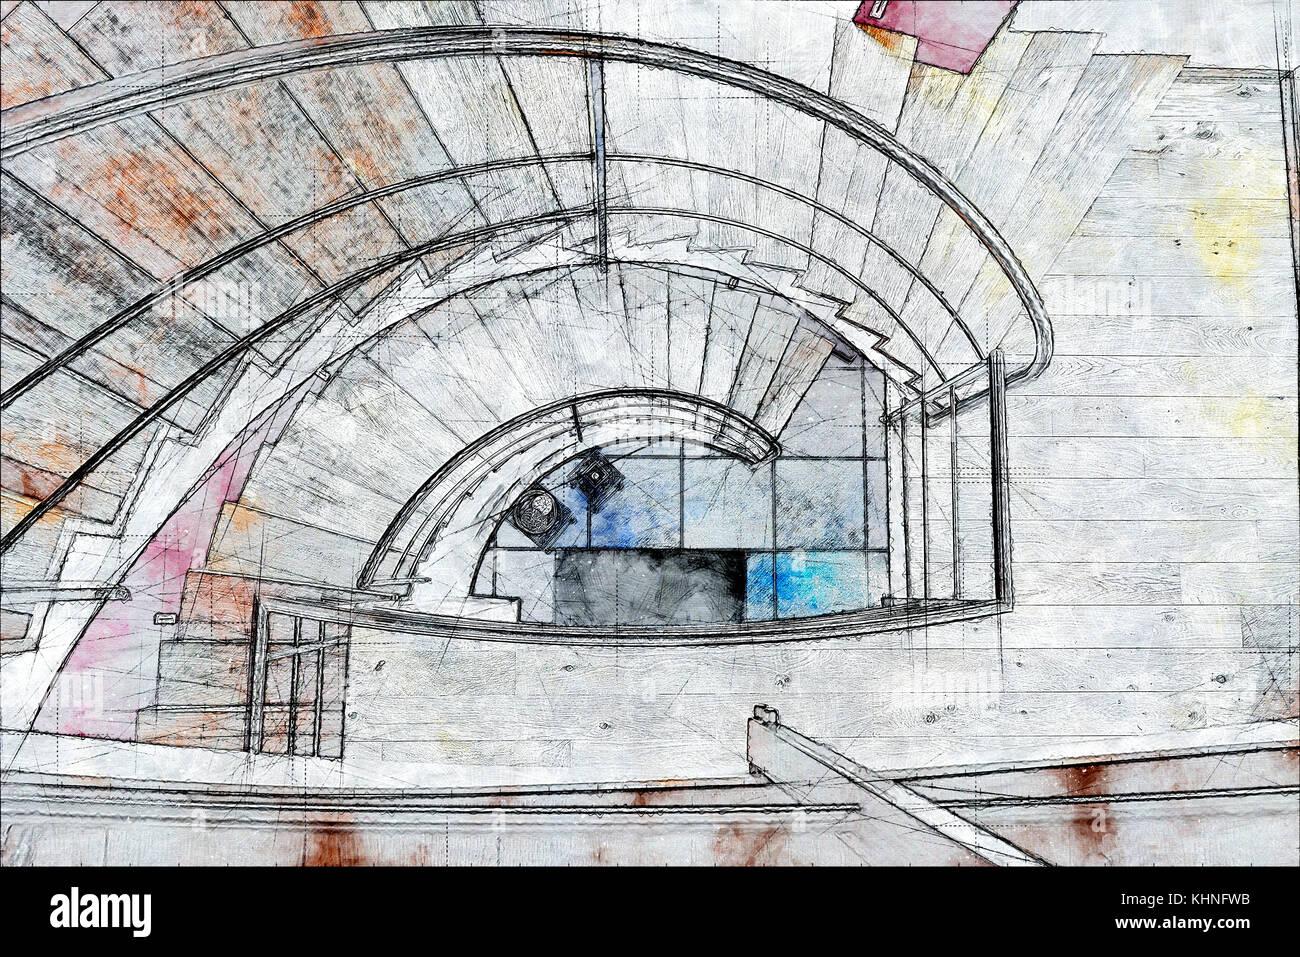 illustration construction stockfotos illustration construction bilder alamy. Black Bedroom Furniture Sets. Home Design Ideas